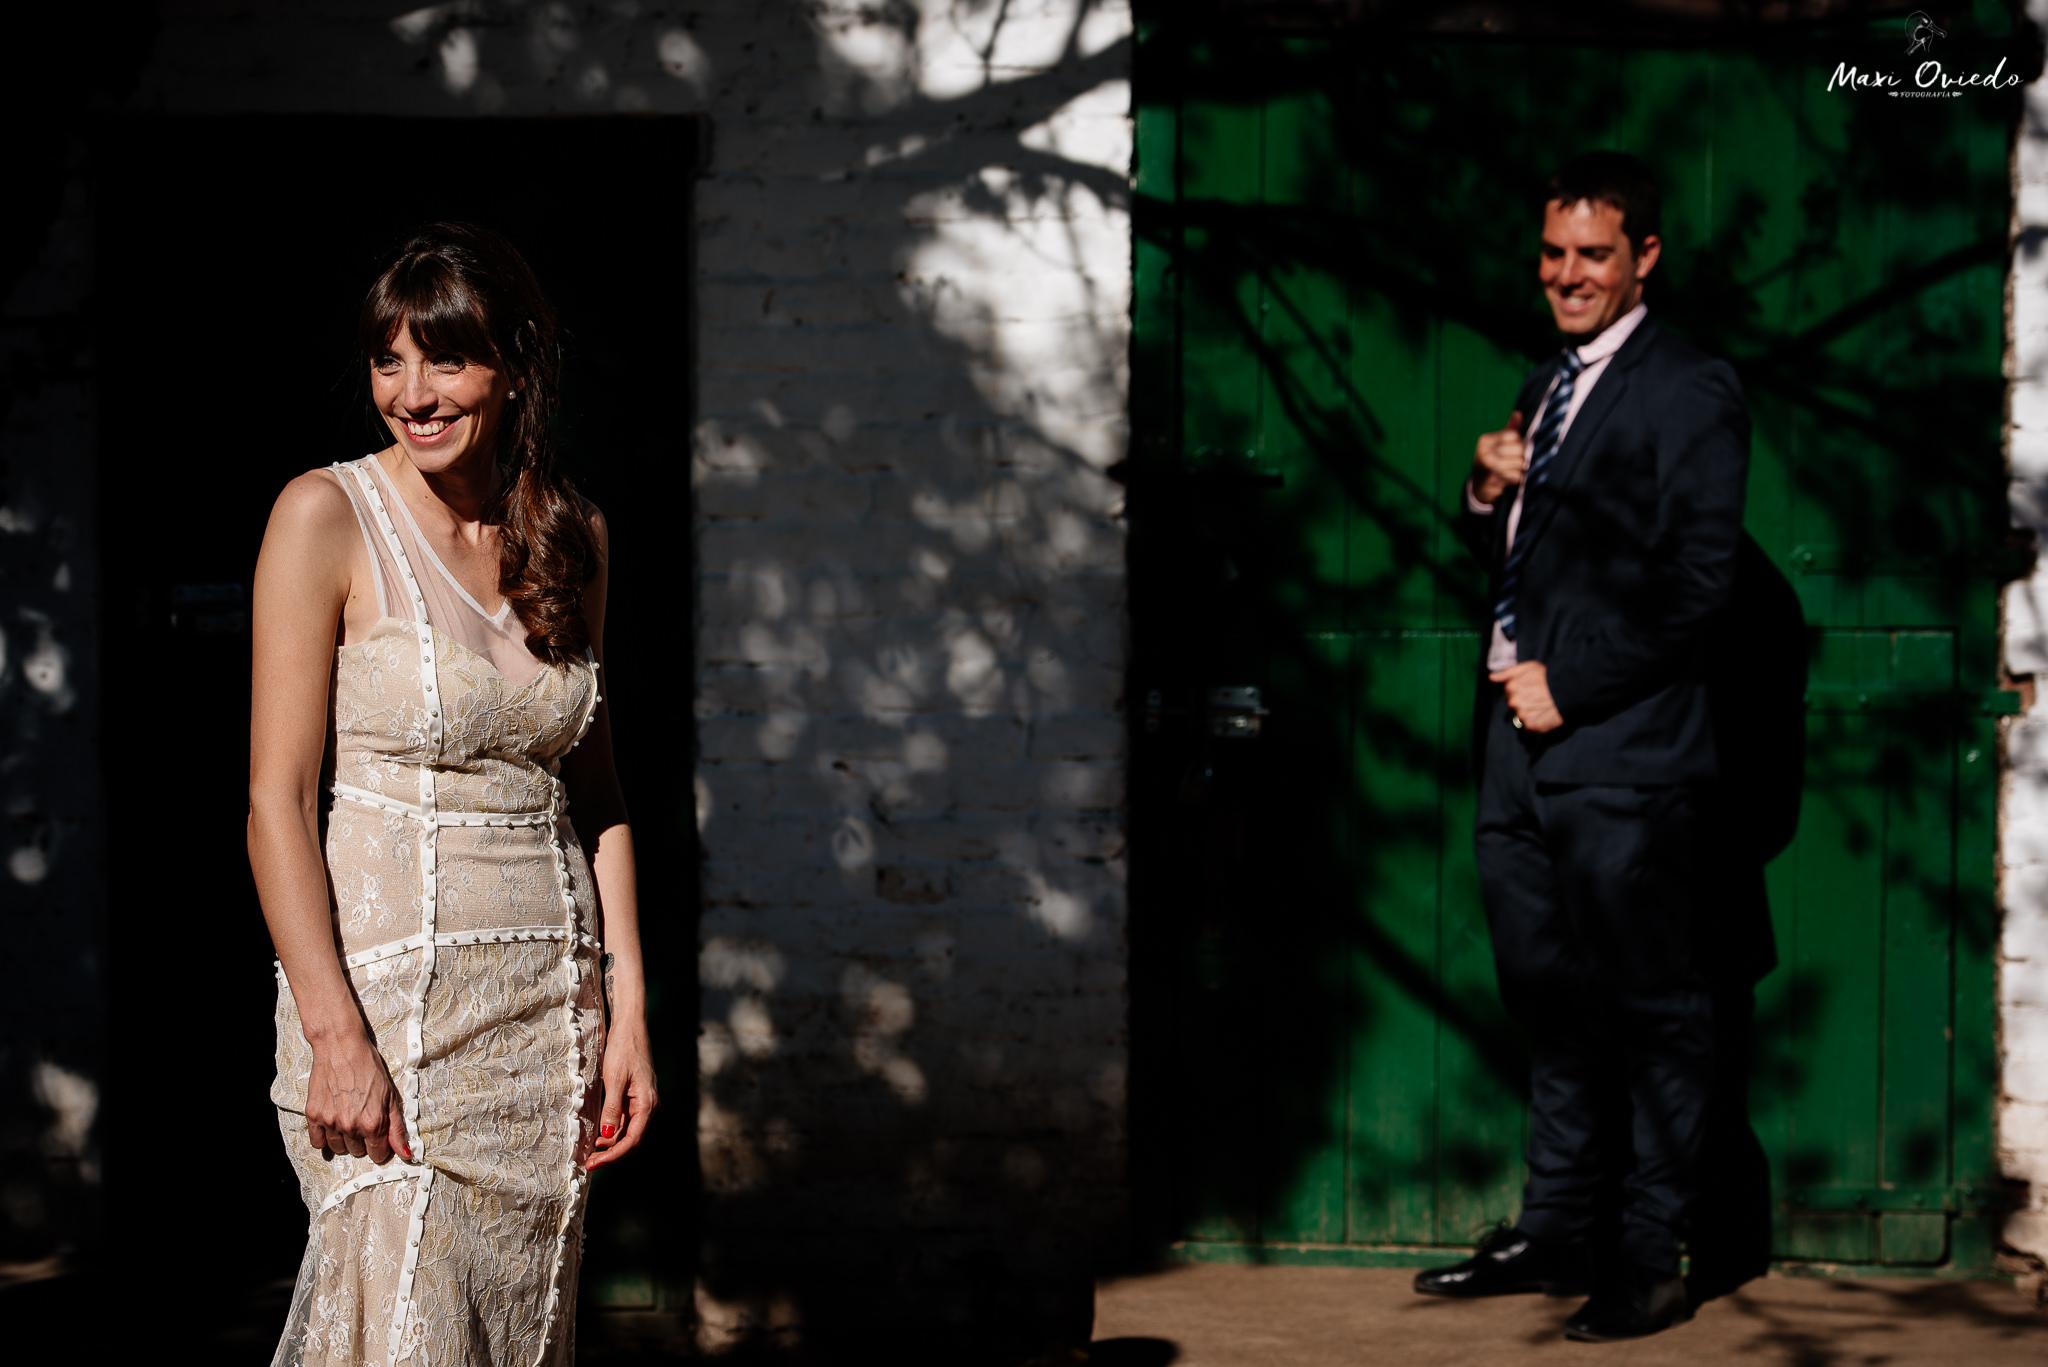 boda sextuple la cumbre cordoba cuchi corral fotografo de bodas fotografo de casamientos rosario san nicolas argentina vestido de novia ramo de novia-11.jpg